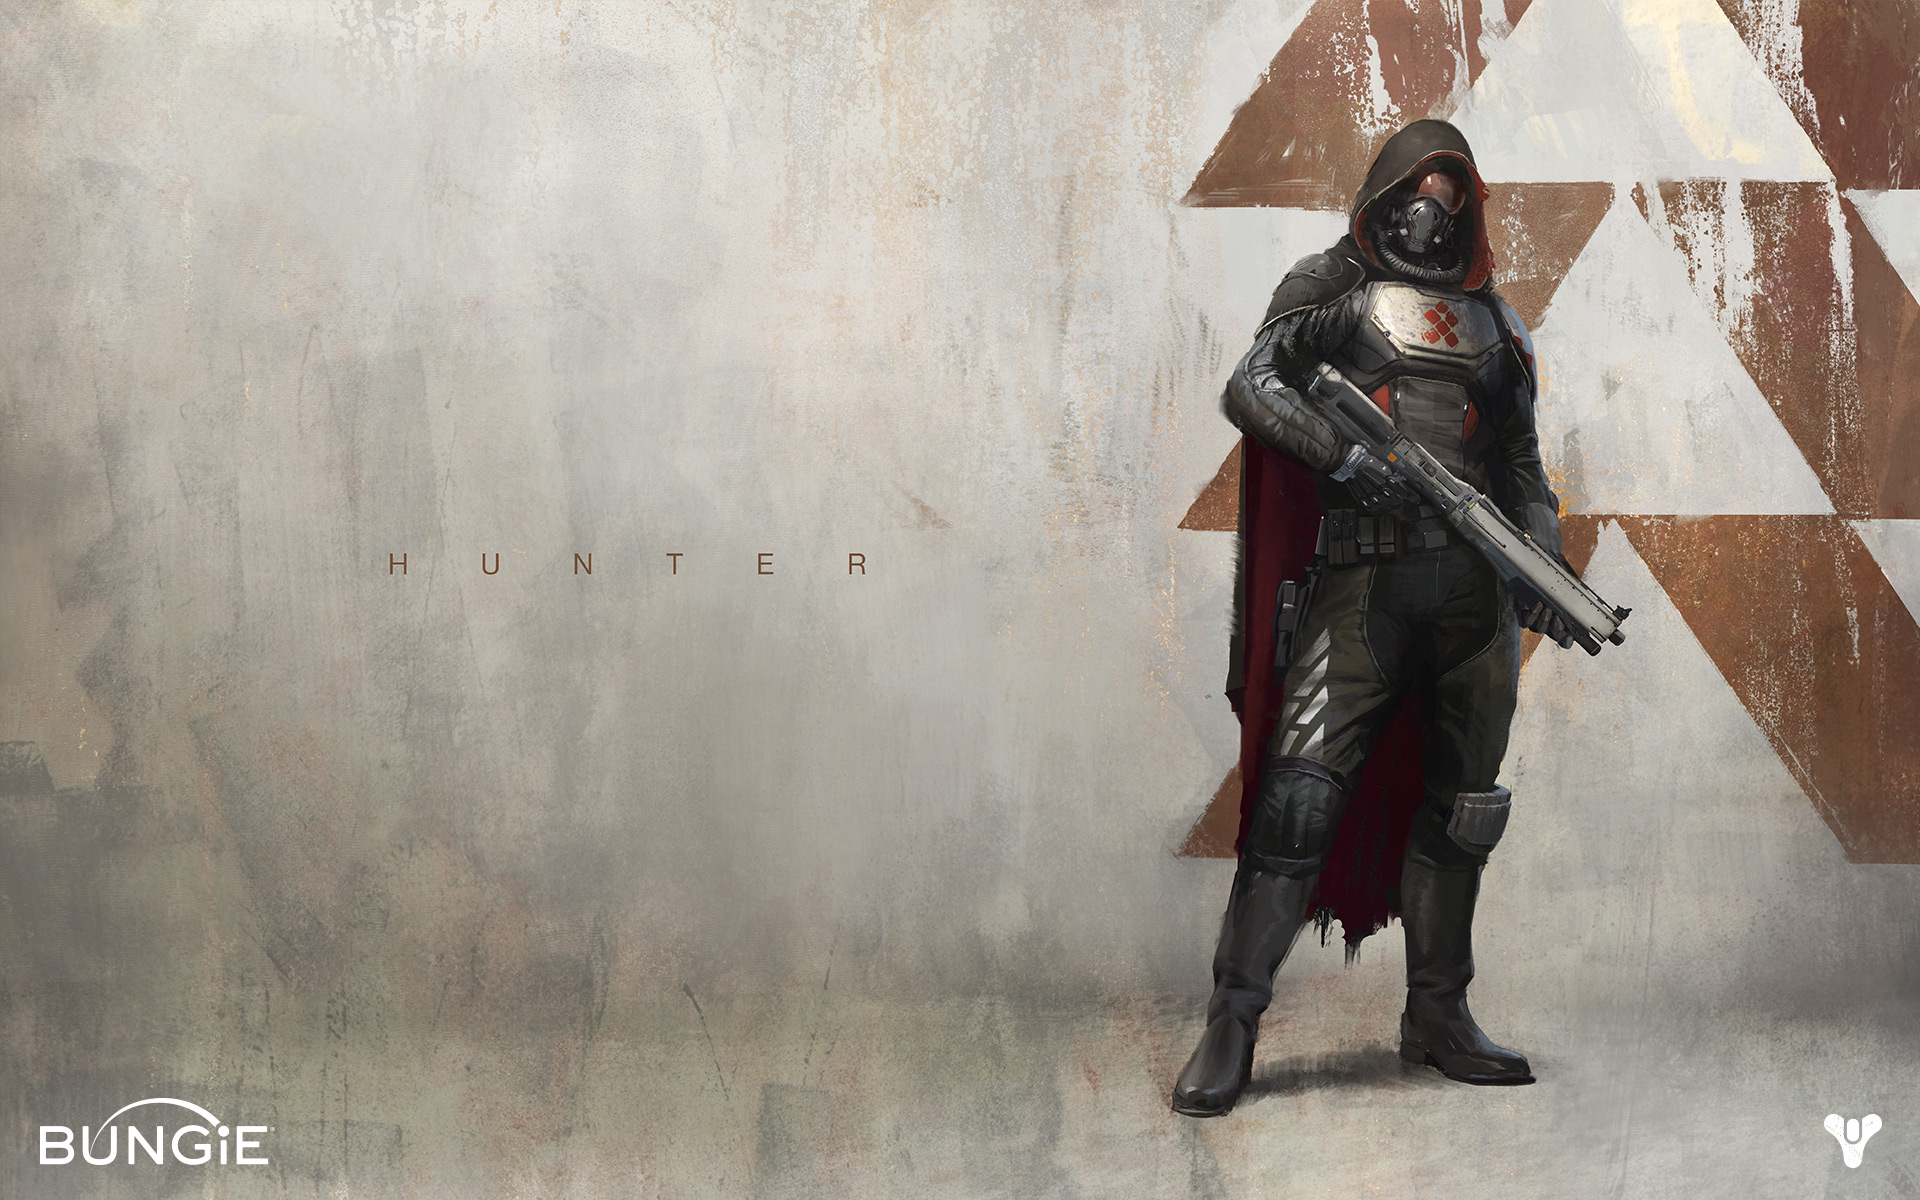 Bungie destiny hunter wallpaper